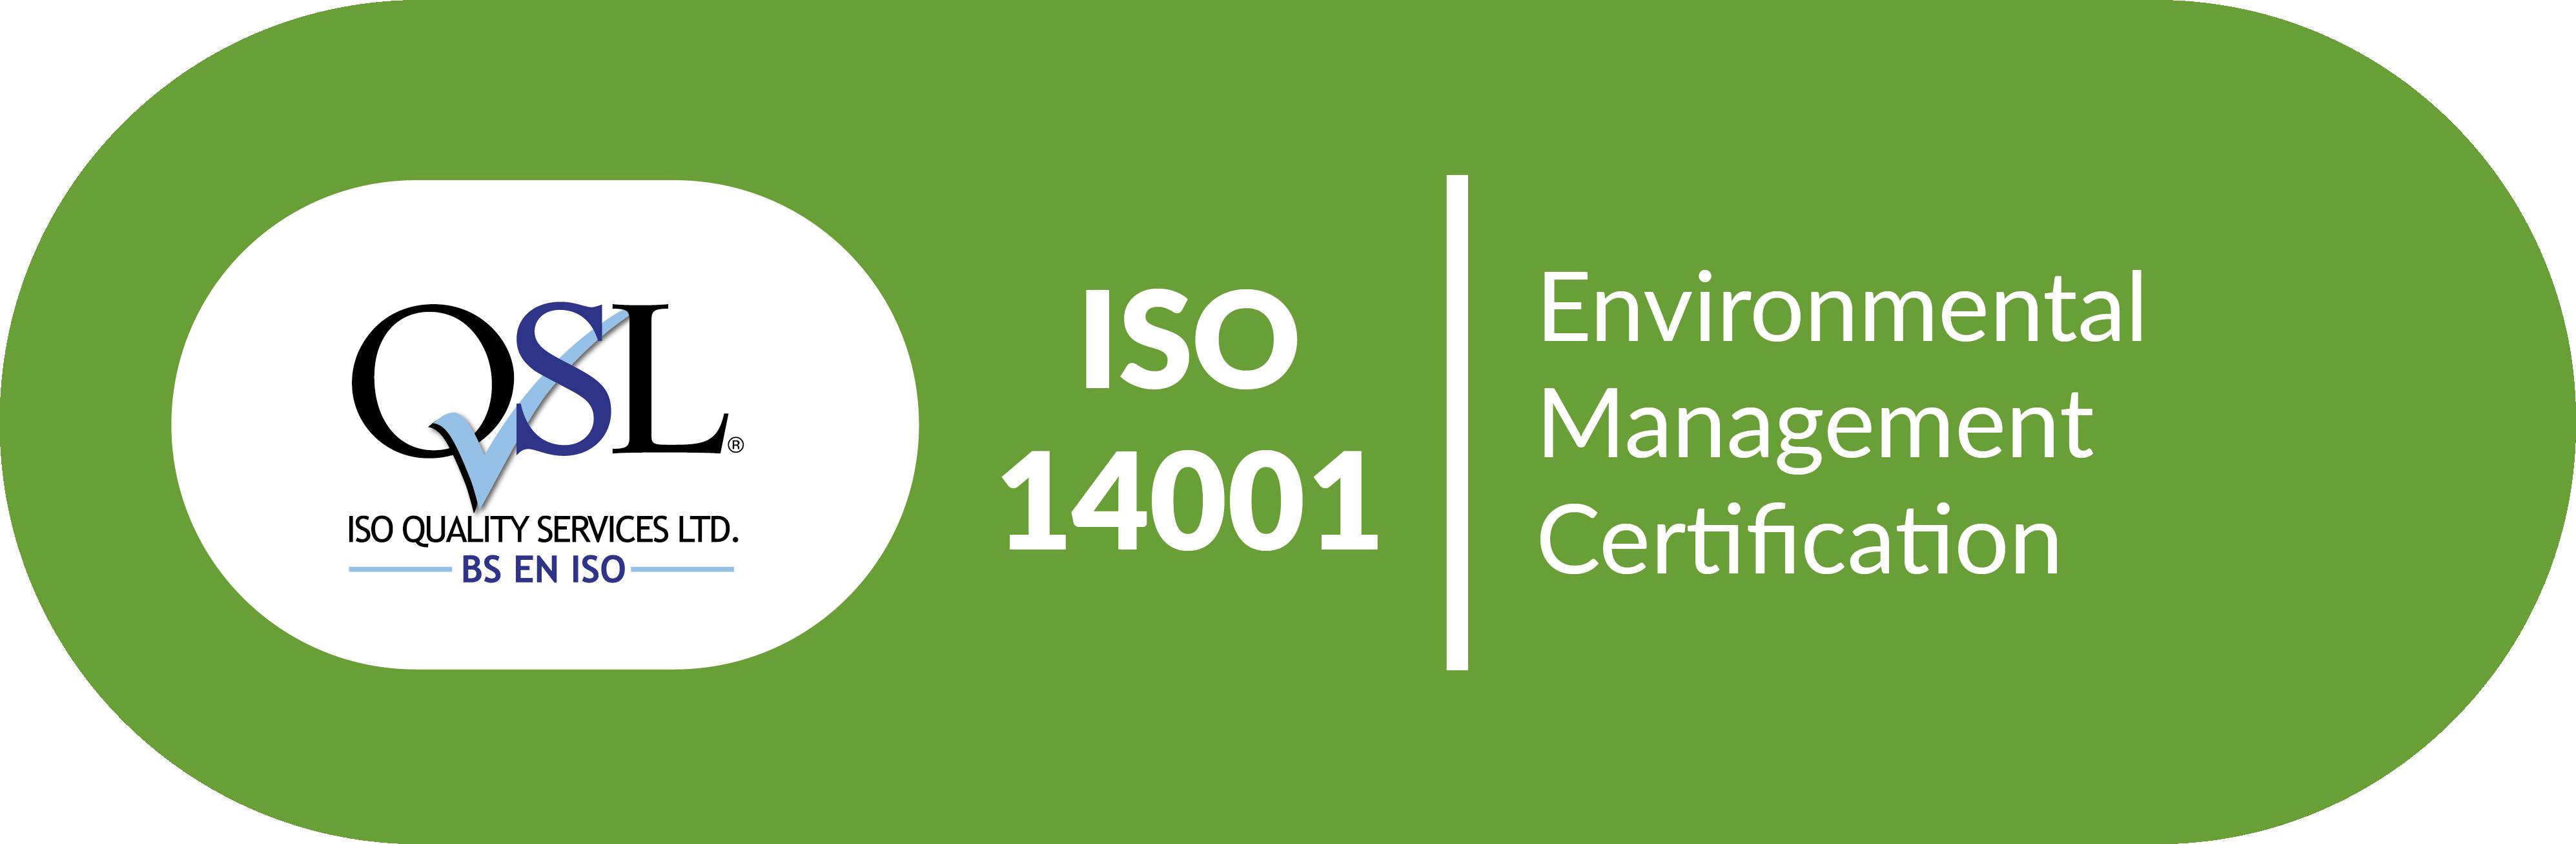 QSL Environmental Management Certificate